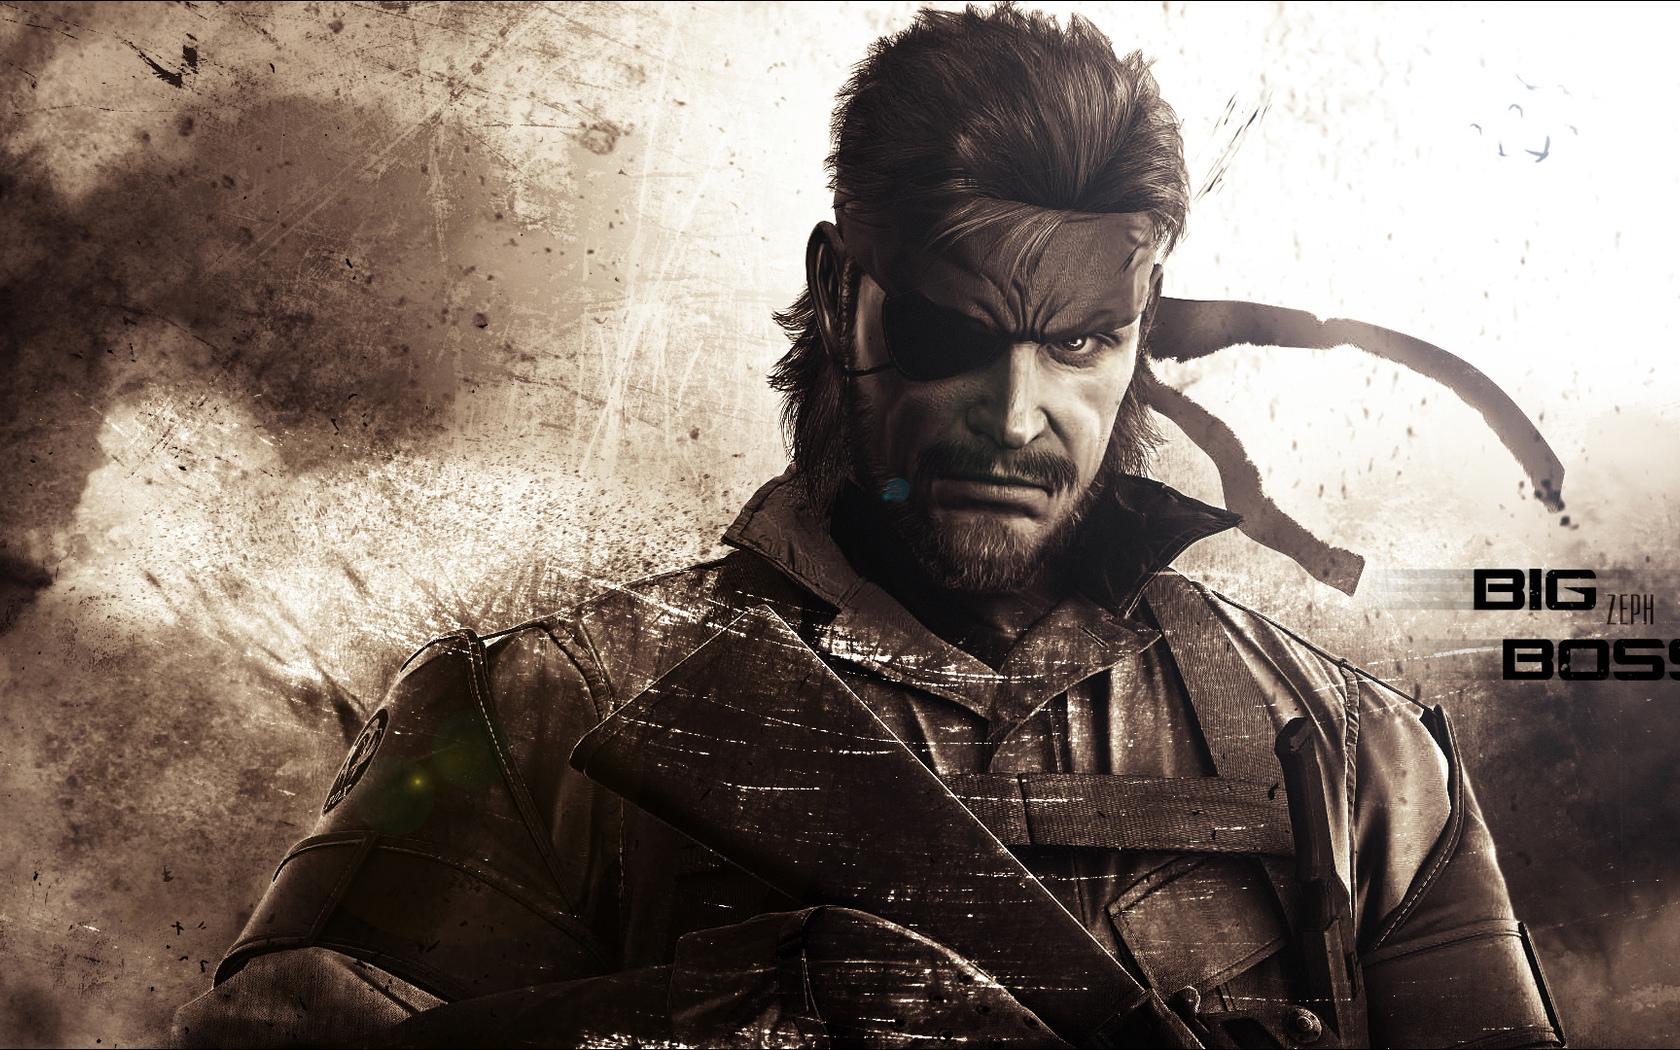 Big Boss Metal Gear Know Your Meme